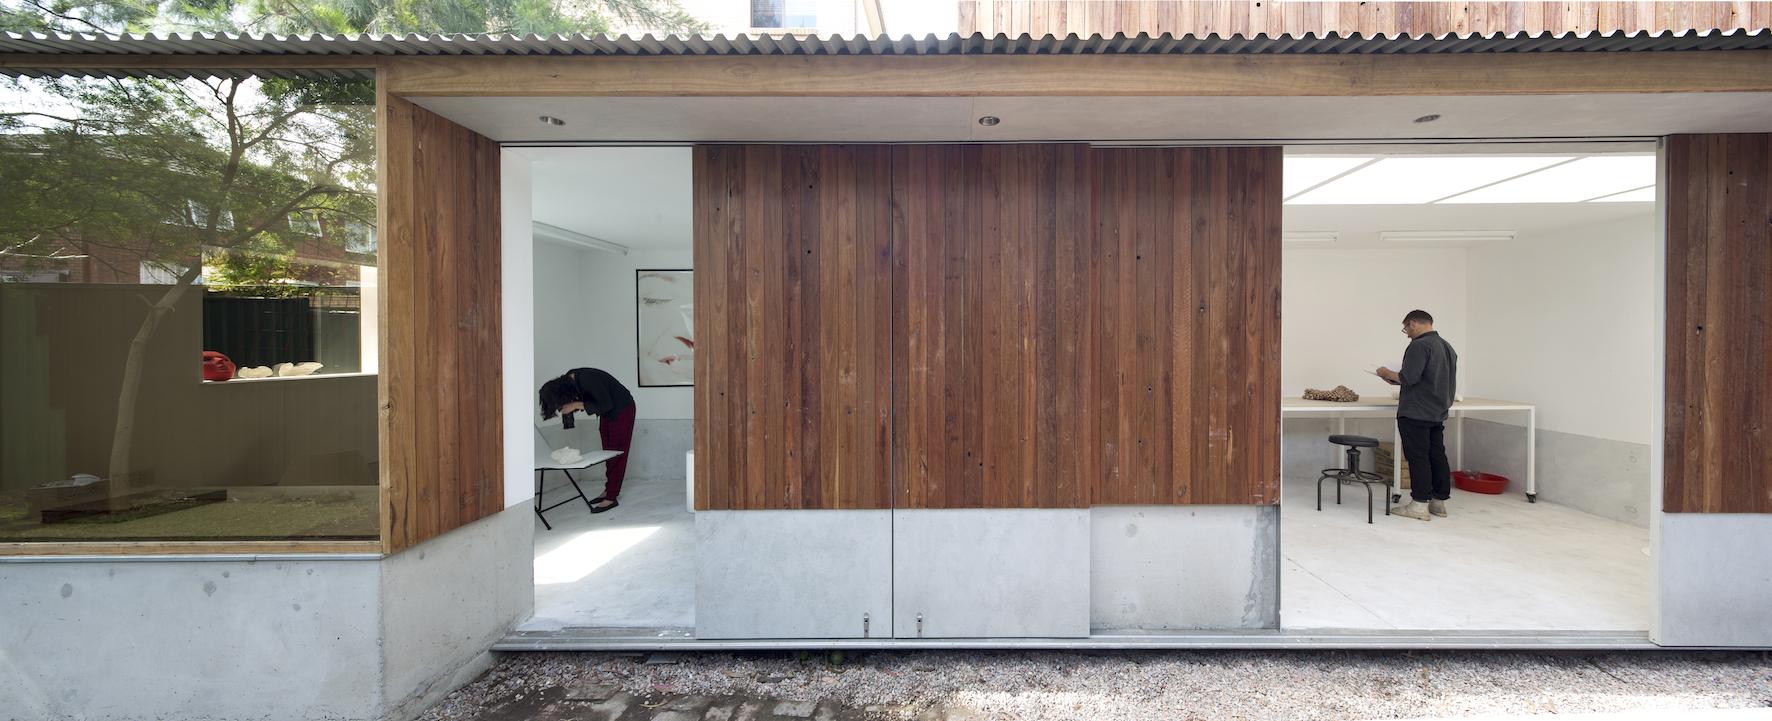 the-garden-gallery